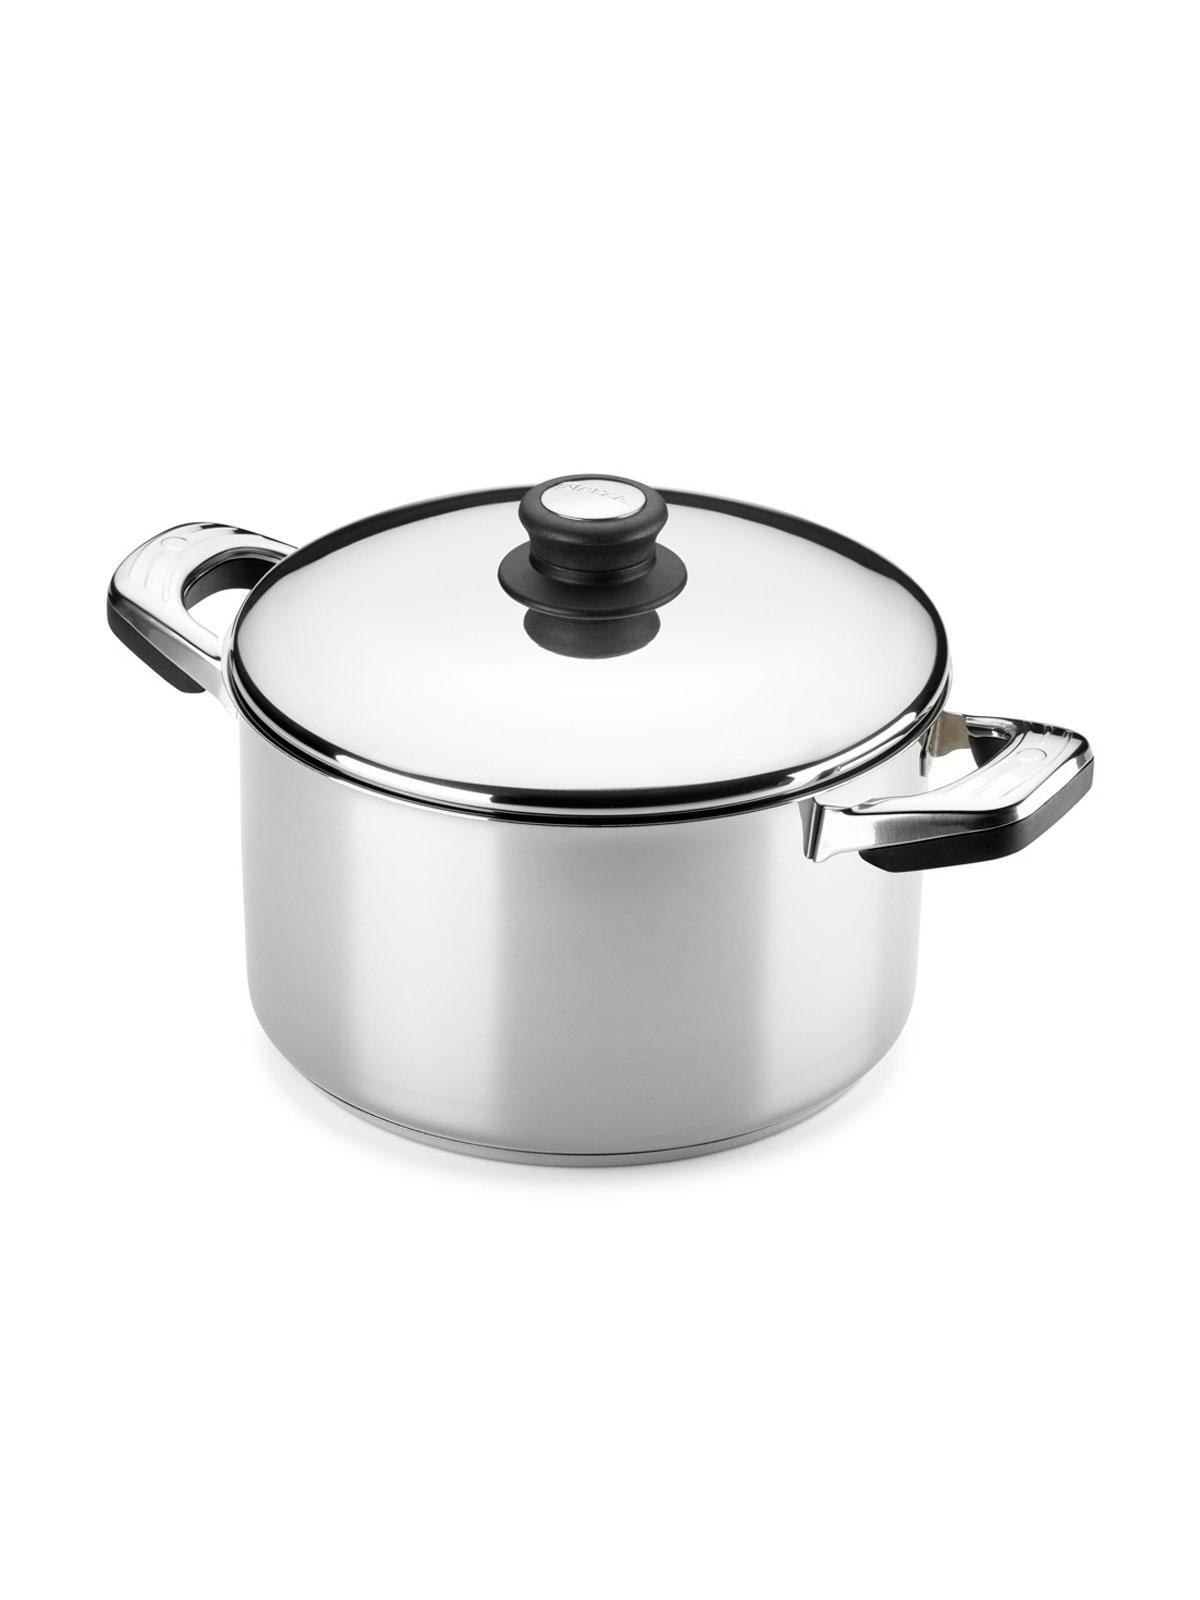 Al38030016 olla con tapa 16cm royal alza menaje utensilios for Lista de menaje de cocina